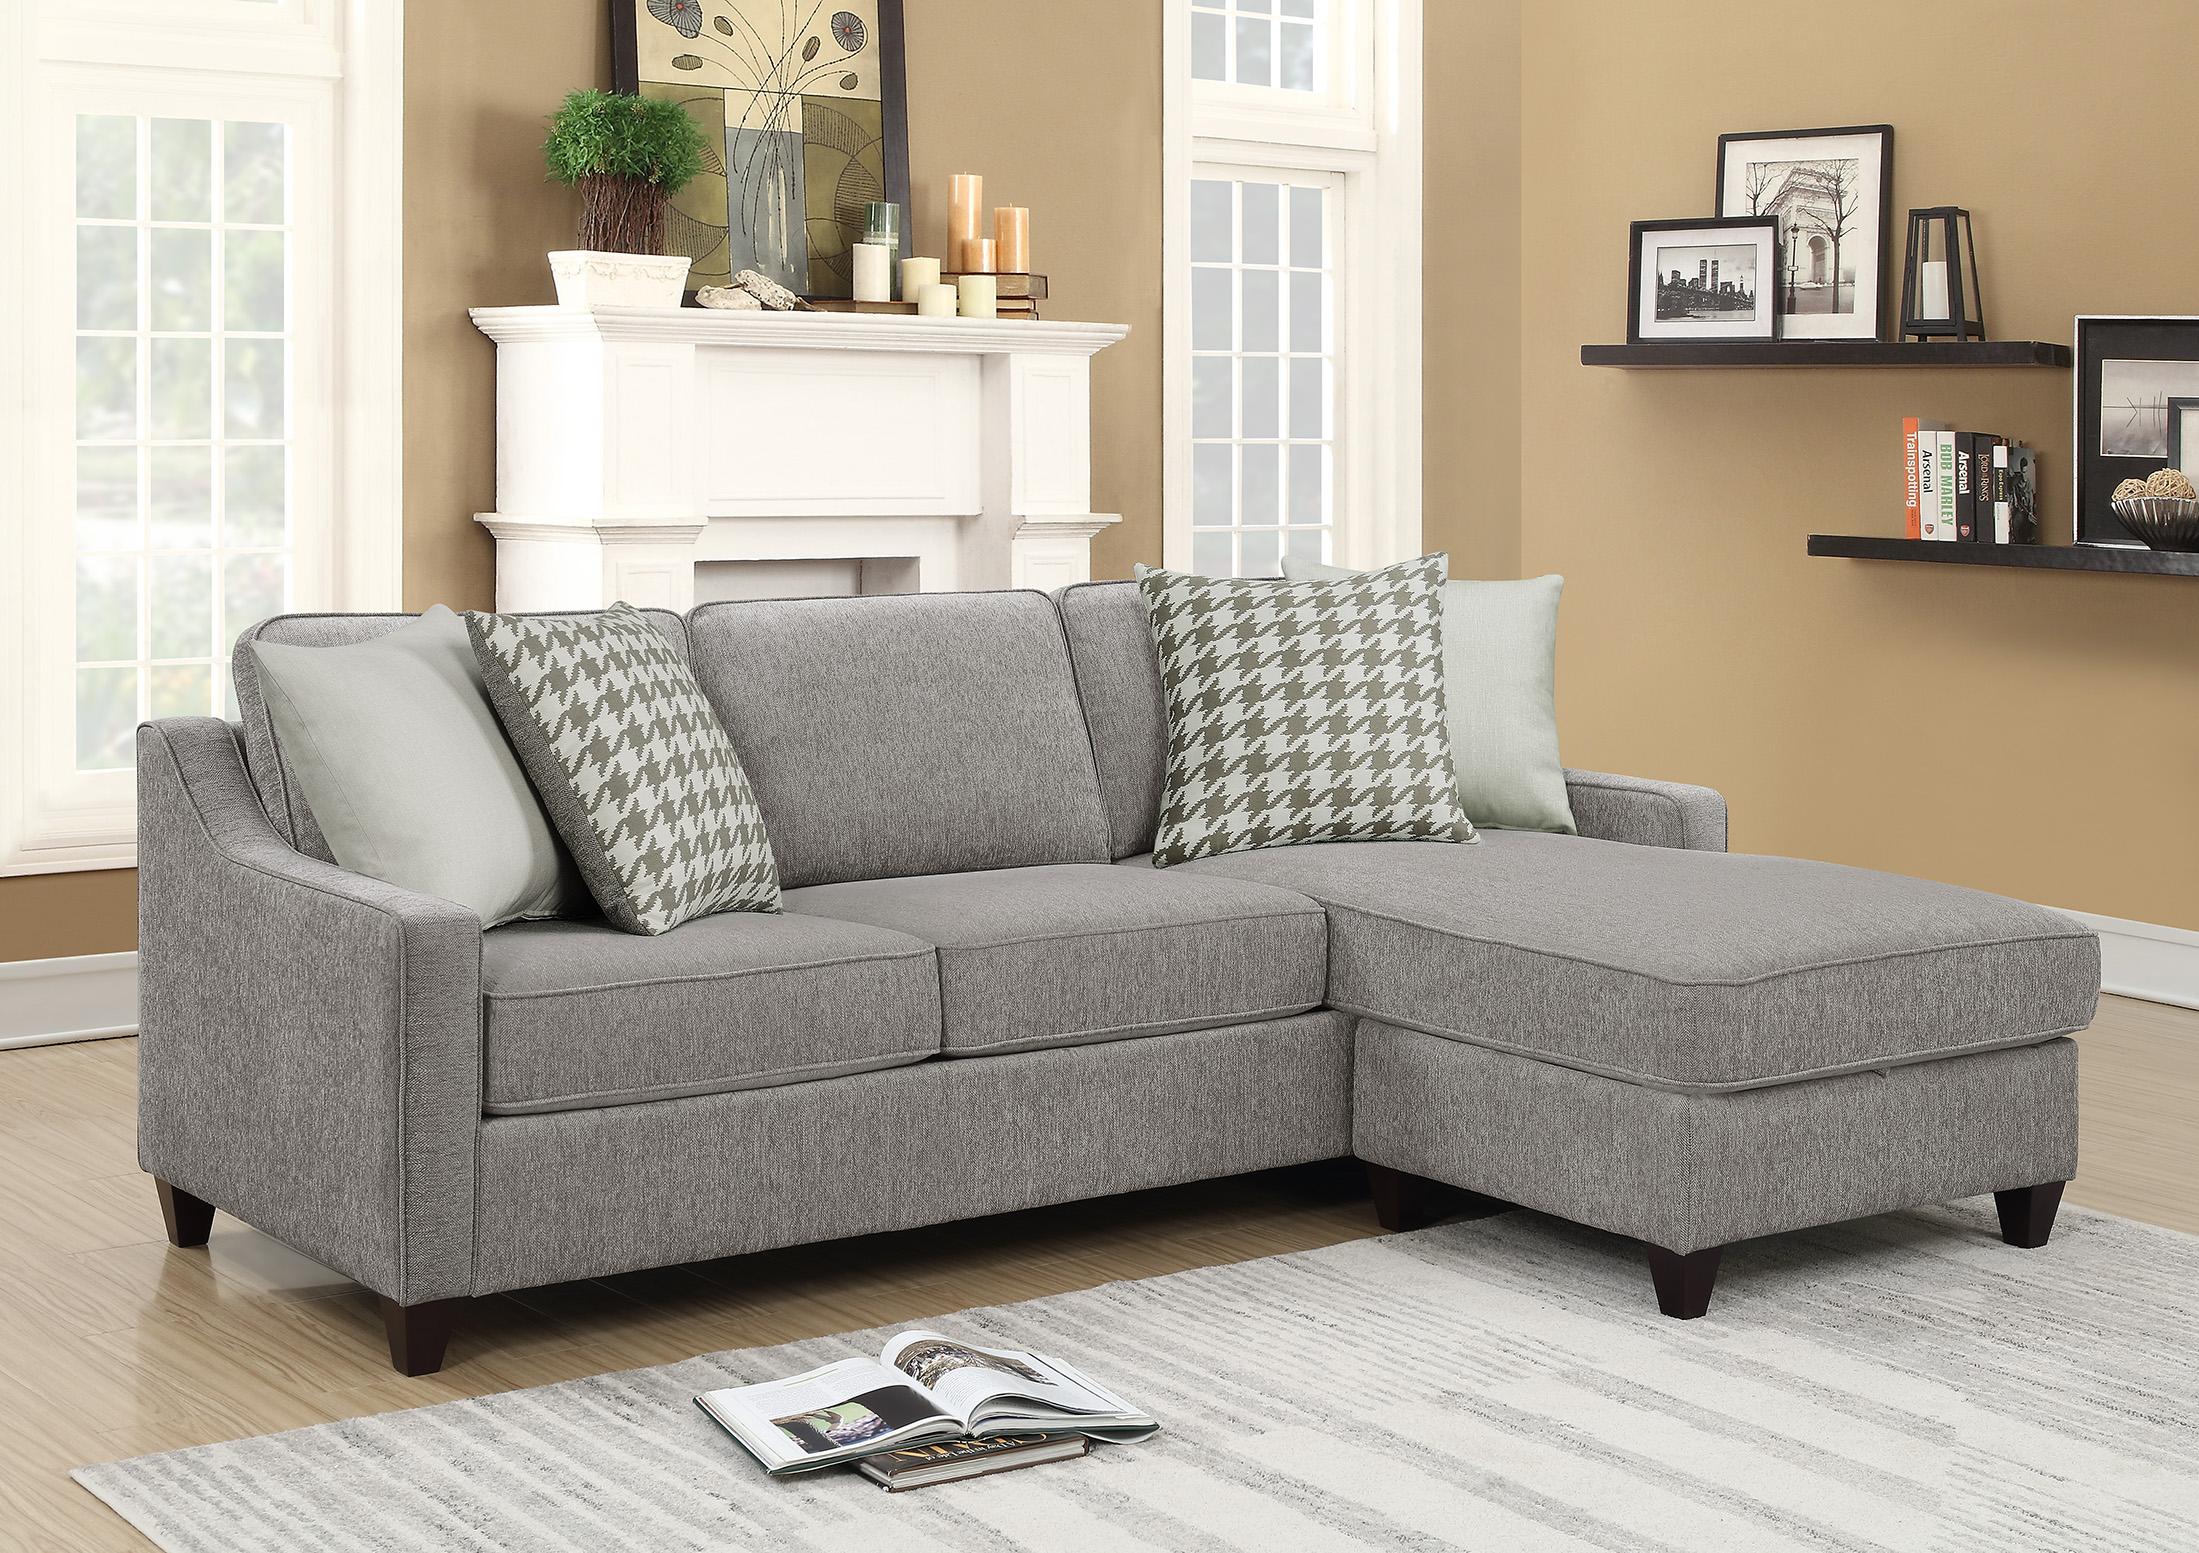 ᐅ Furniture Stores In Miami Modern Furniture Distribution Center